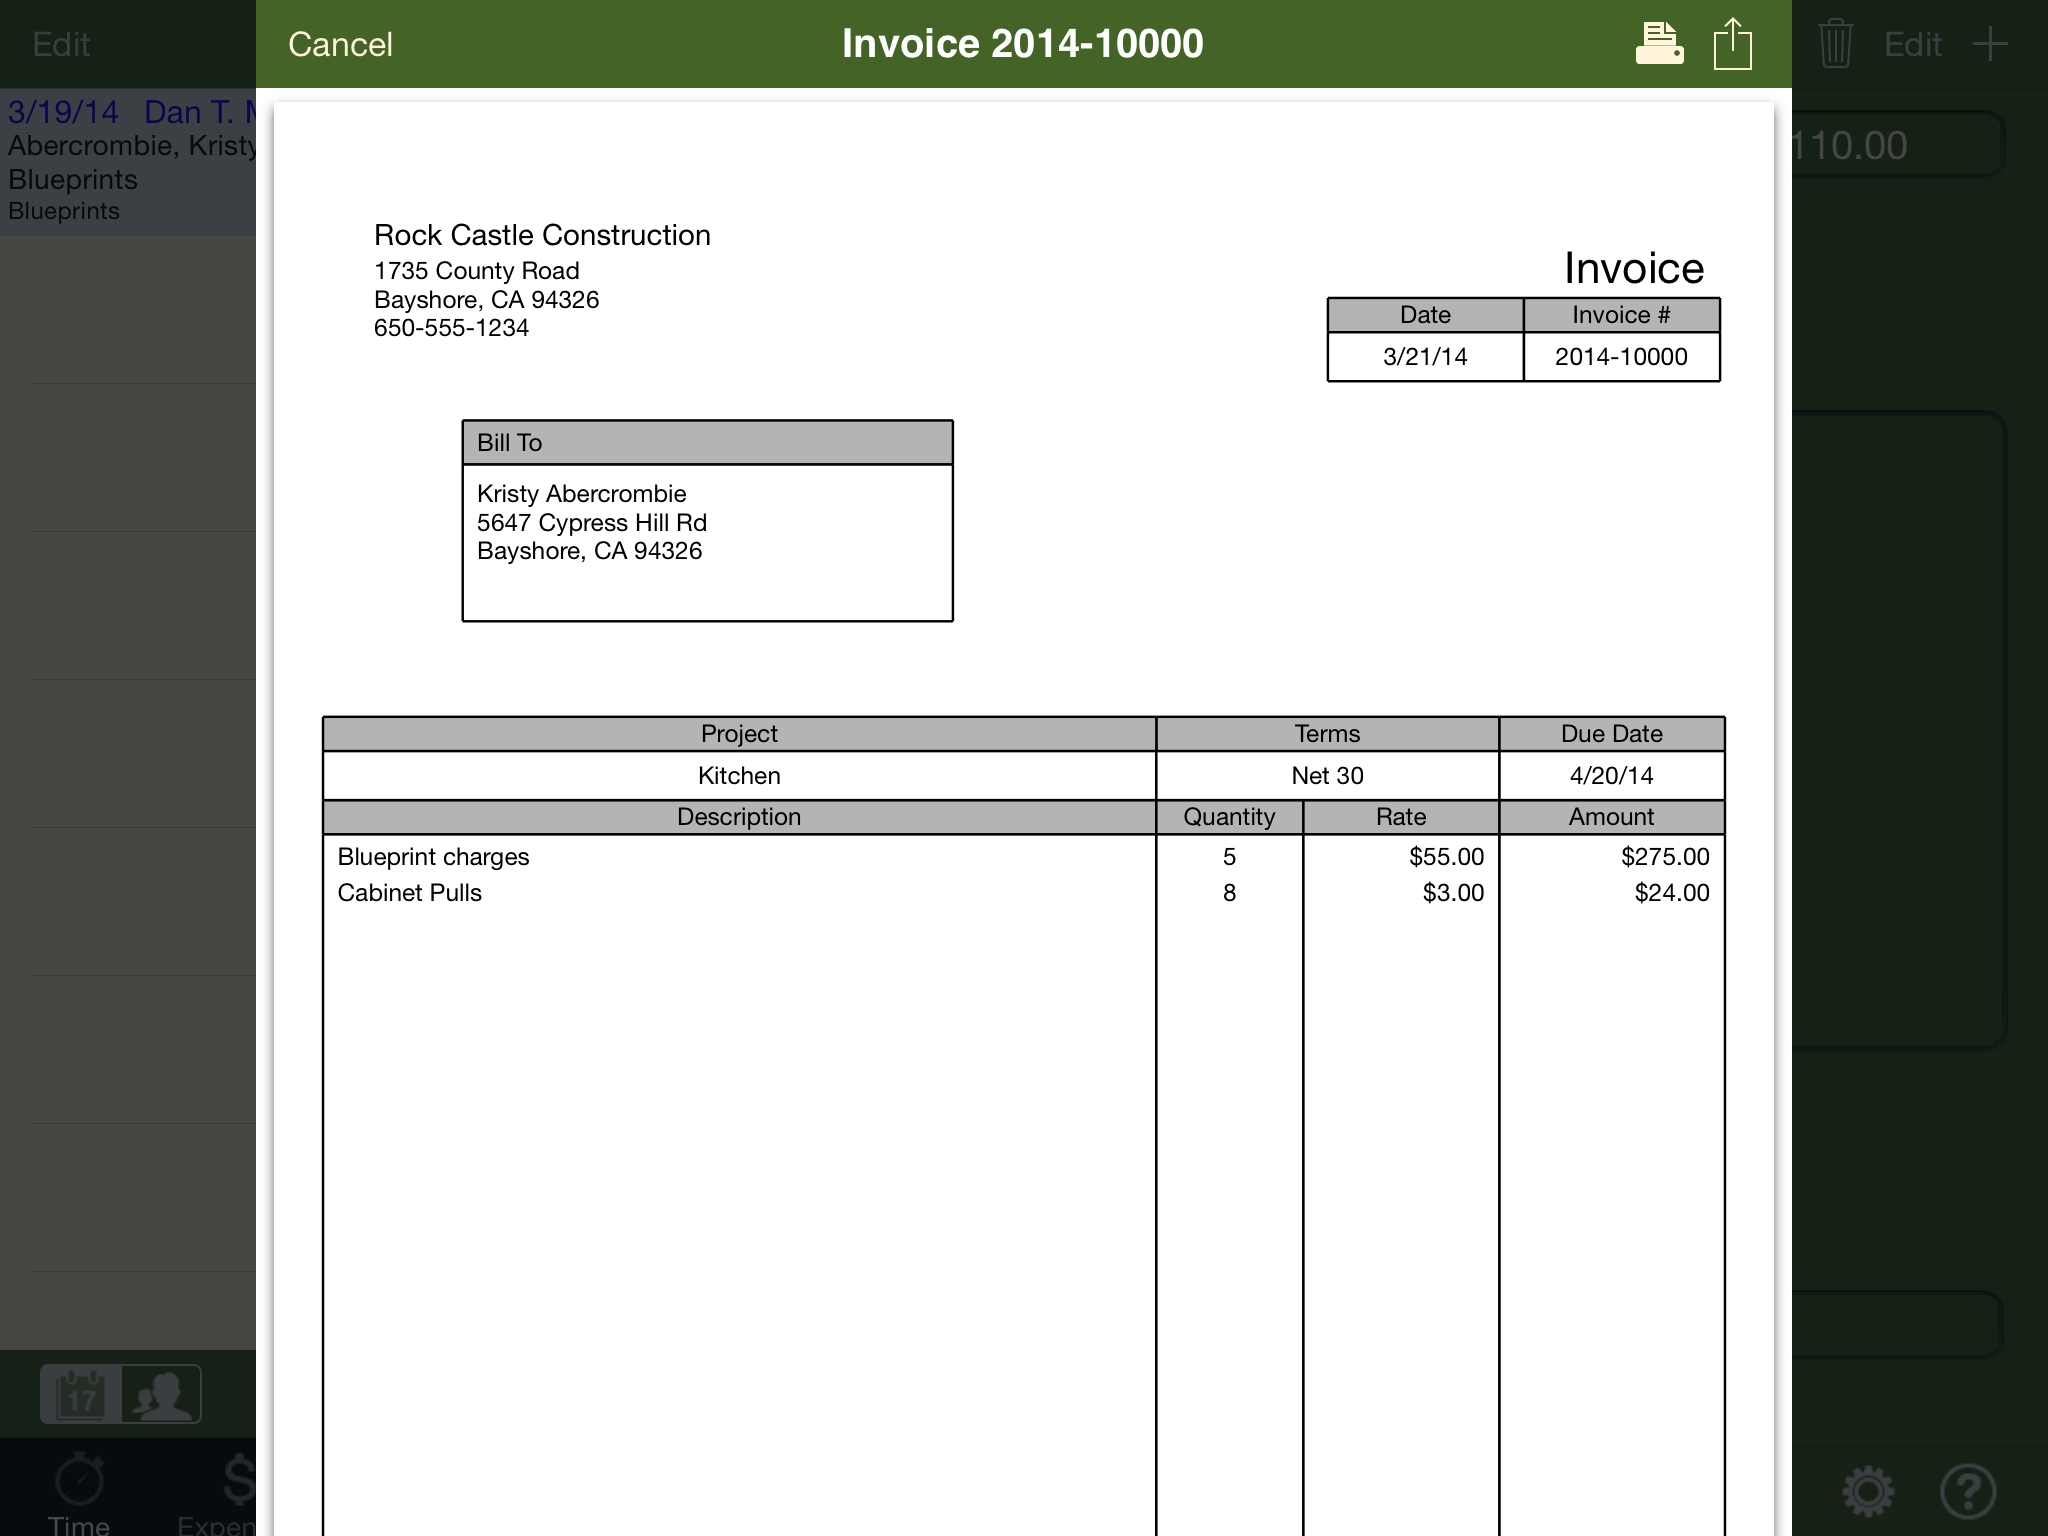 quickbooks invoice templates ipad invoice pdf quickbooks invoice invoice template for ipad